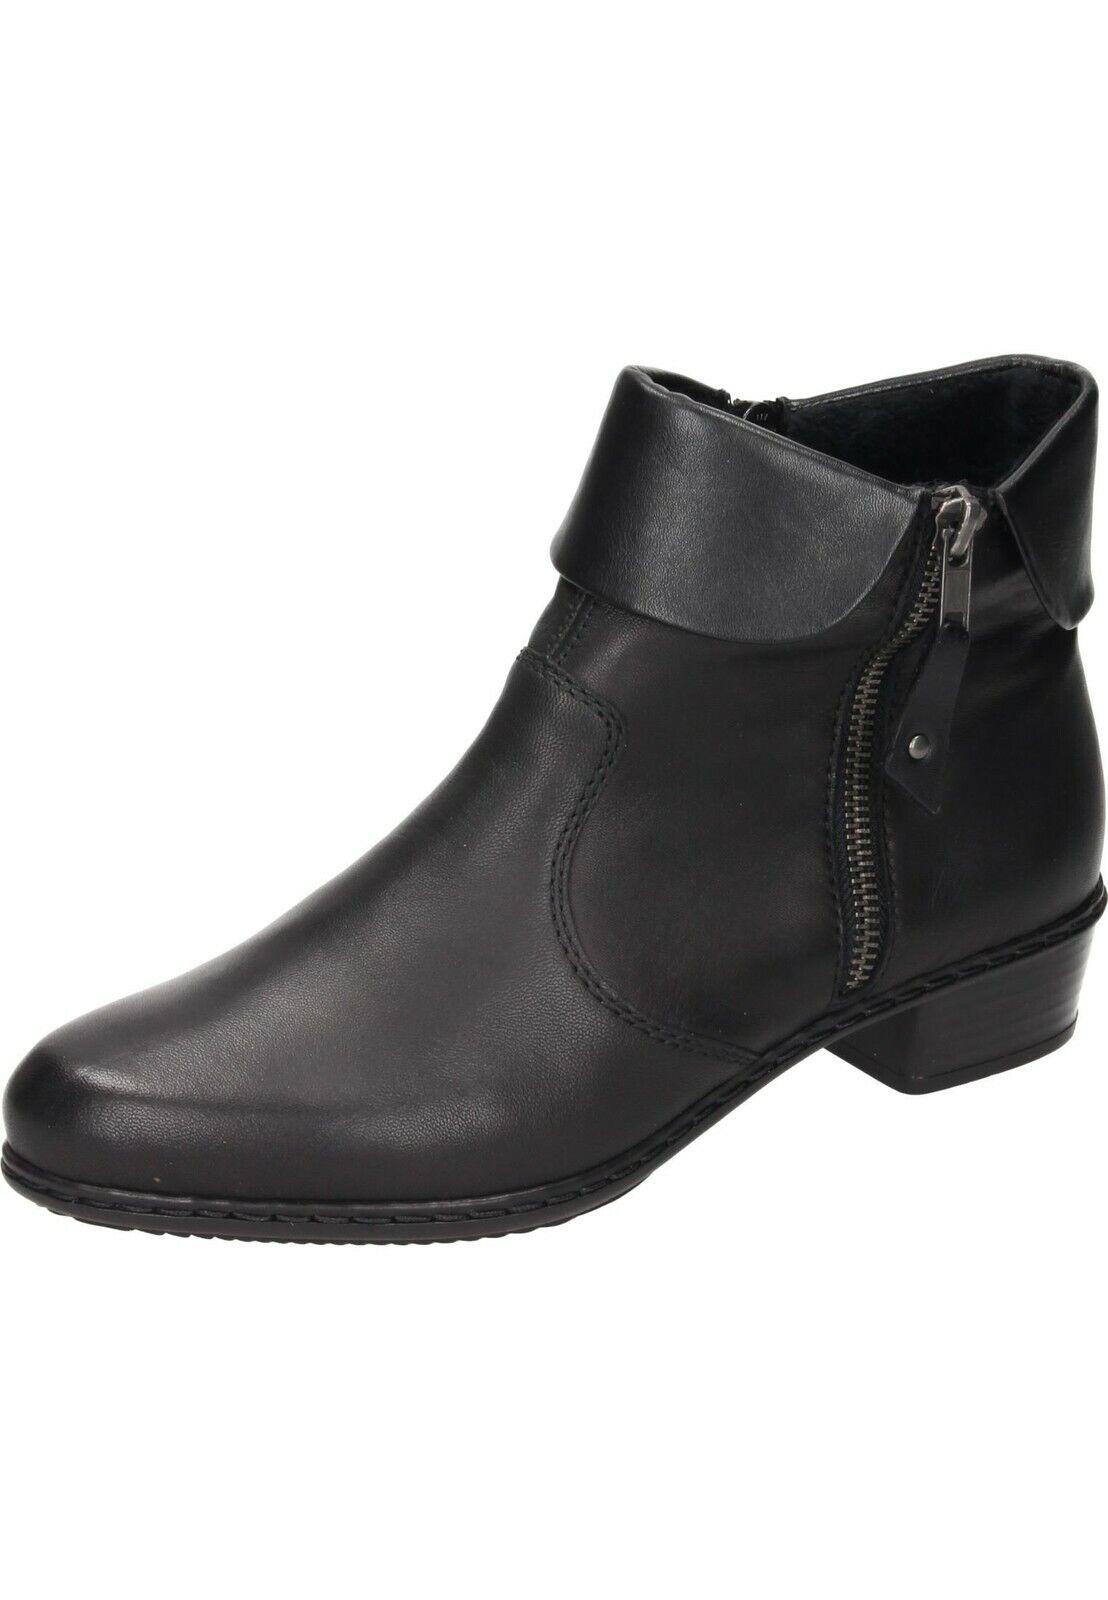 Rieker Y07A8-00 Stiefeletten Leder Ankle Stiefel Schuhe schwarz Gr.36-42 Neu1